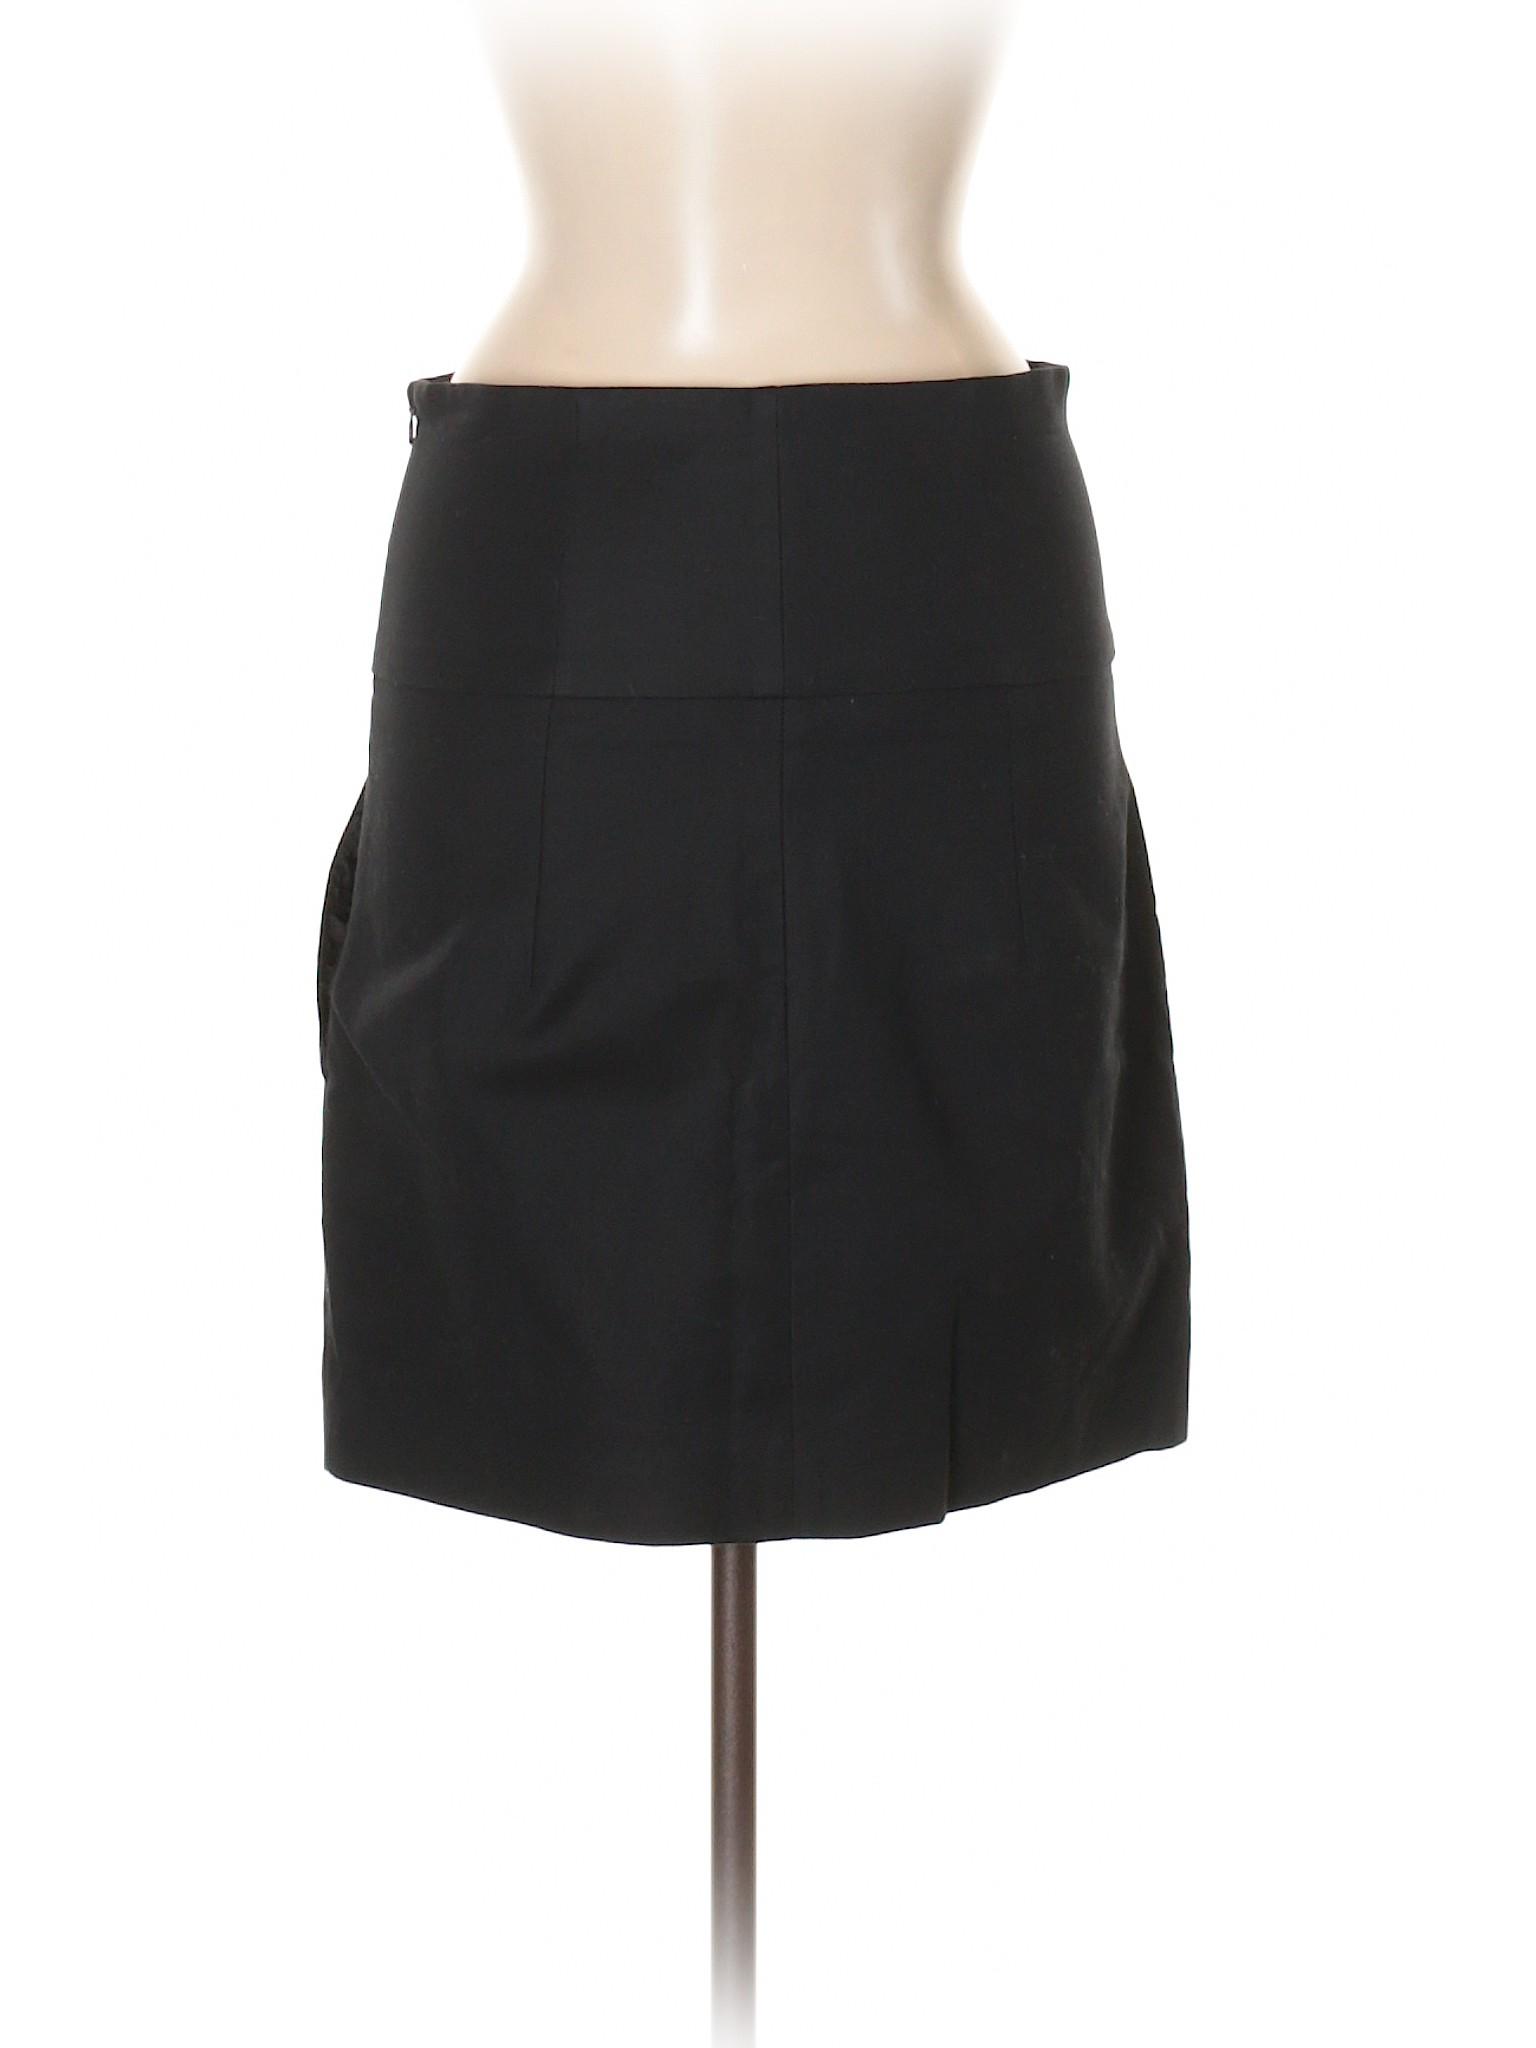 winter winter Skirt Leisure Zara Zara Casual Skirt Casual Leisure winter Leisure EAqHR